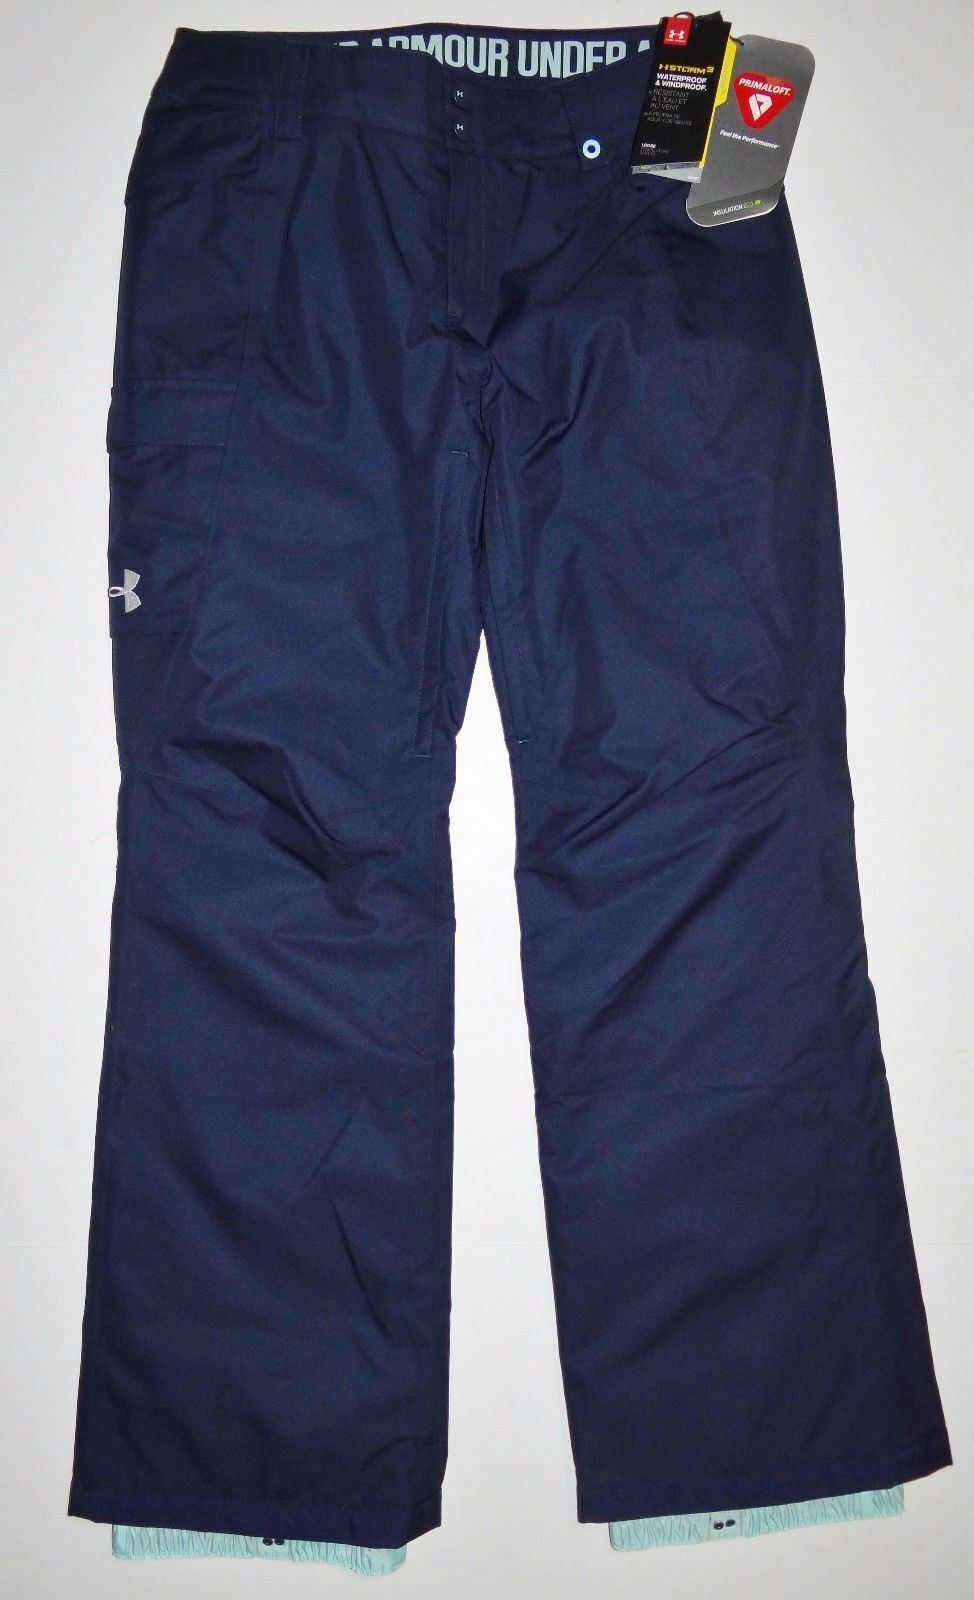 Nuovo Under Armour Donna ColdGear Infrarosso Chutes Snowboard Ski Pants Small